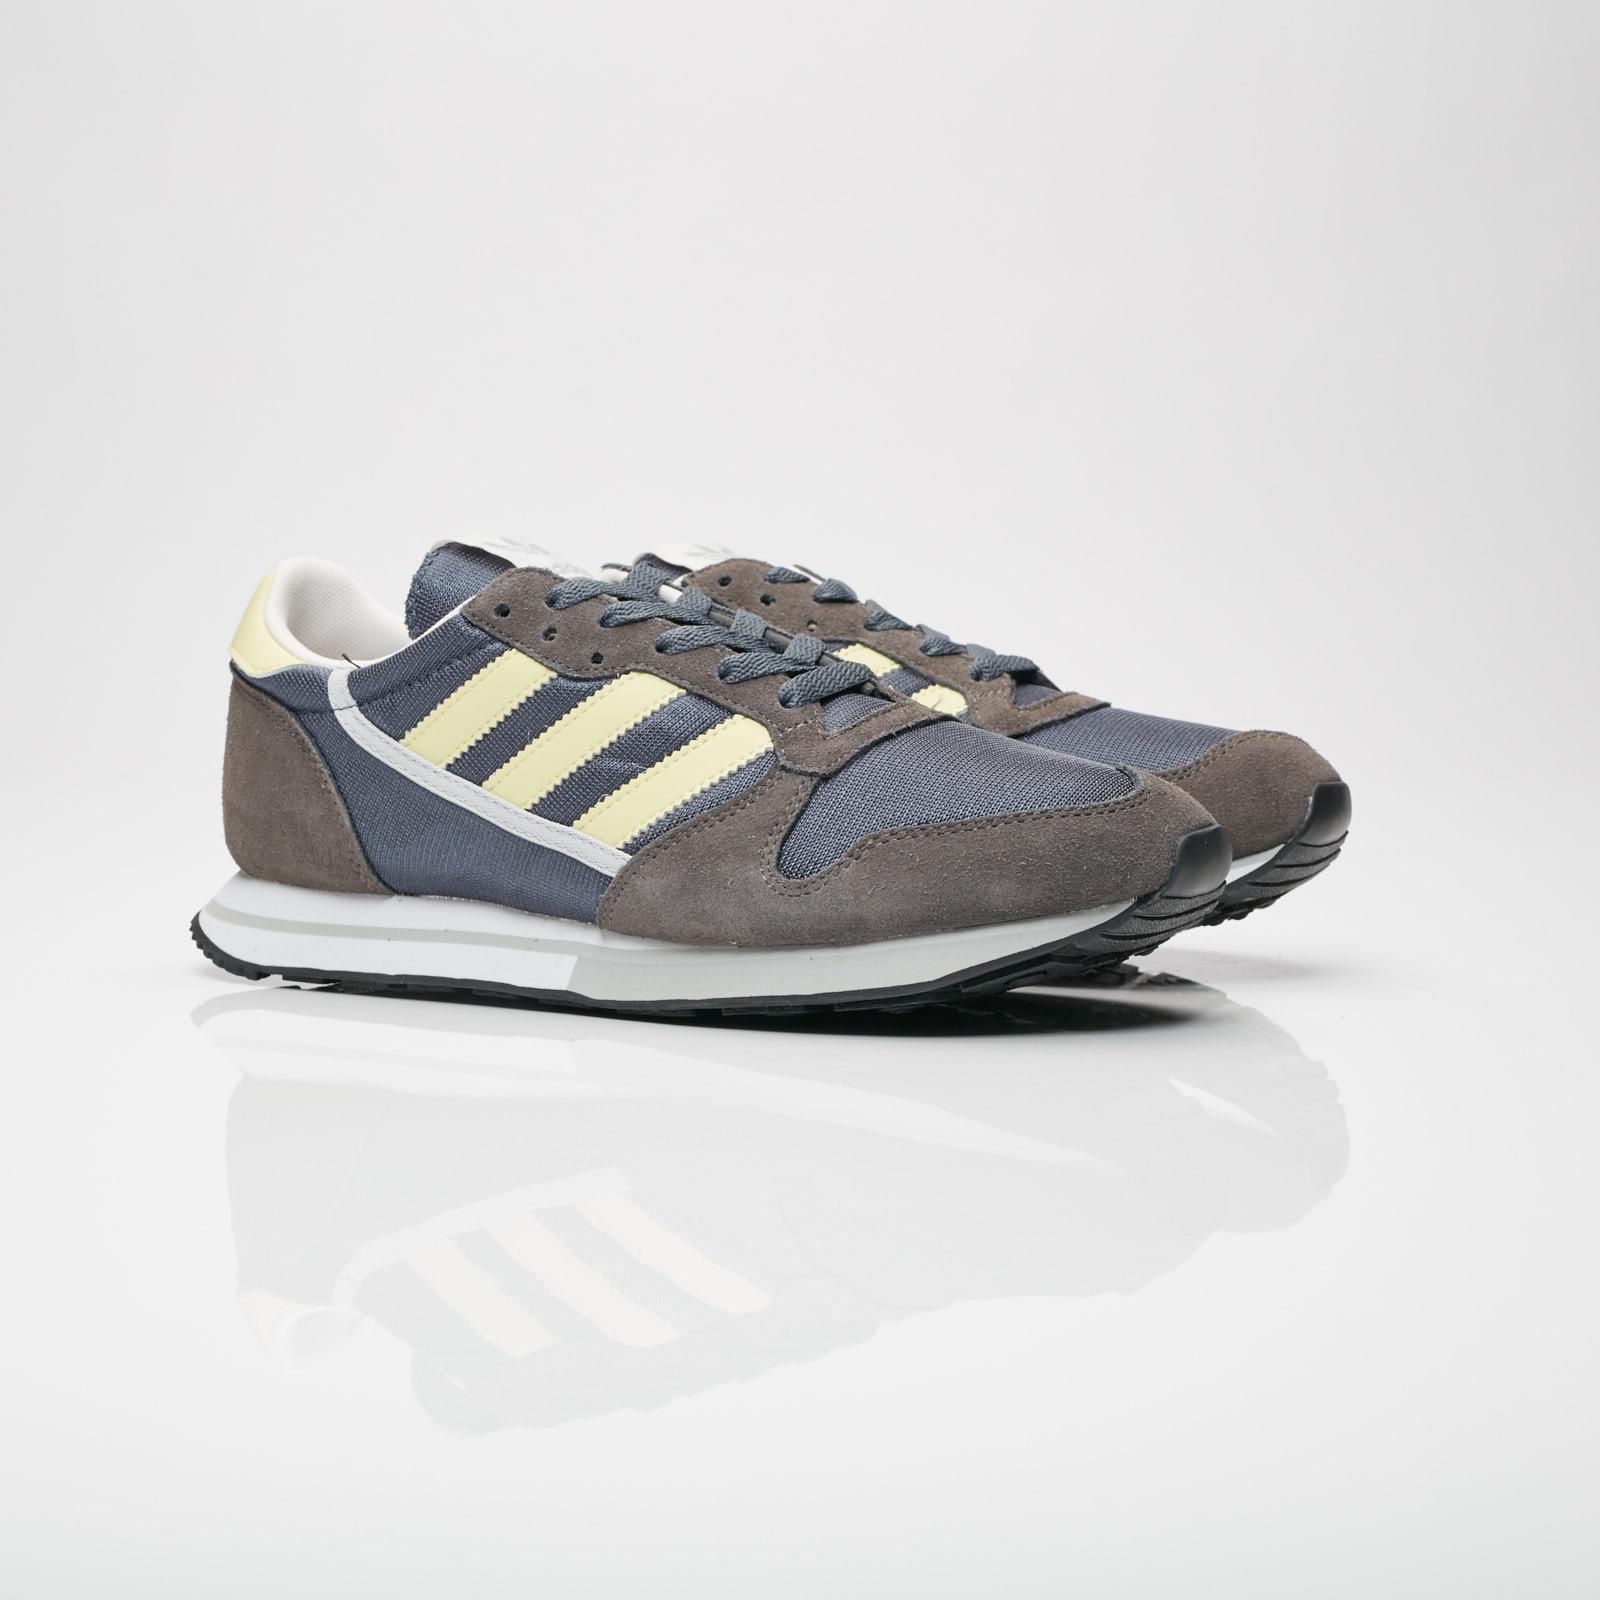 2e7598382 adidas ZX 280 - Da8750 - Sneakersnstuff